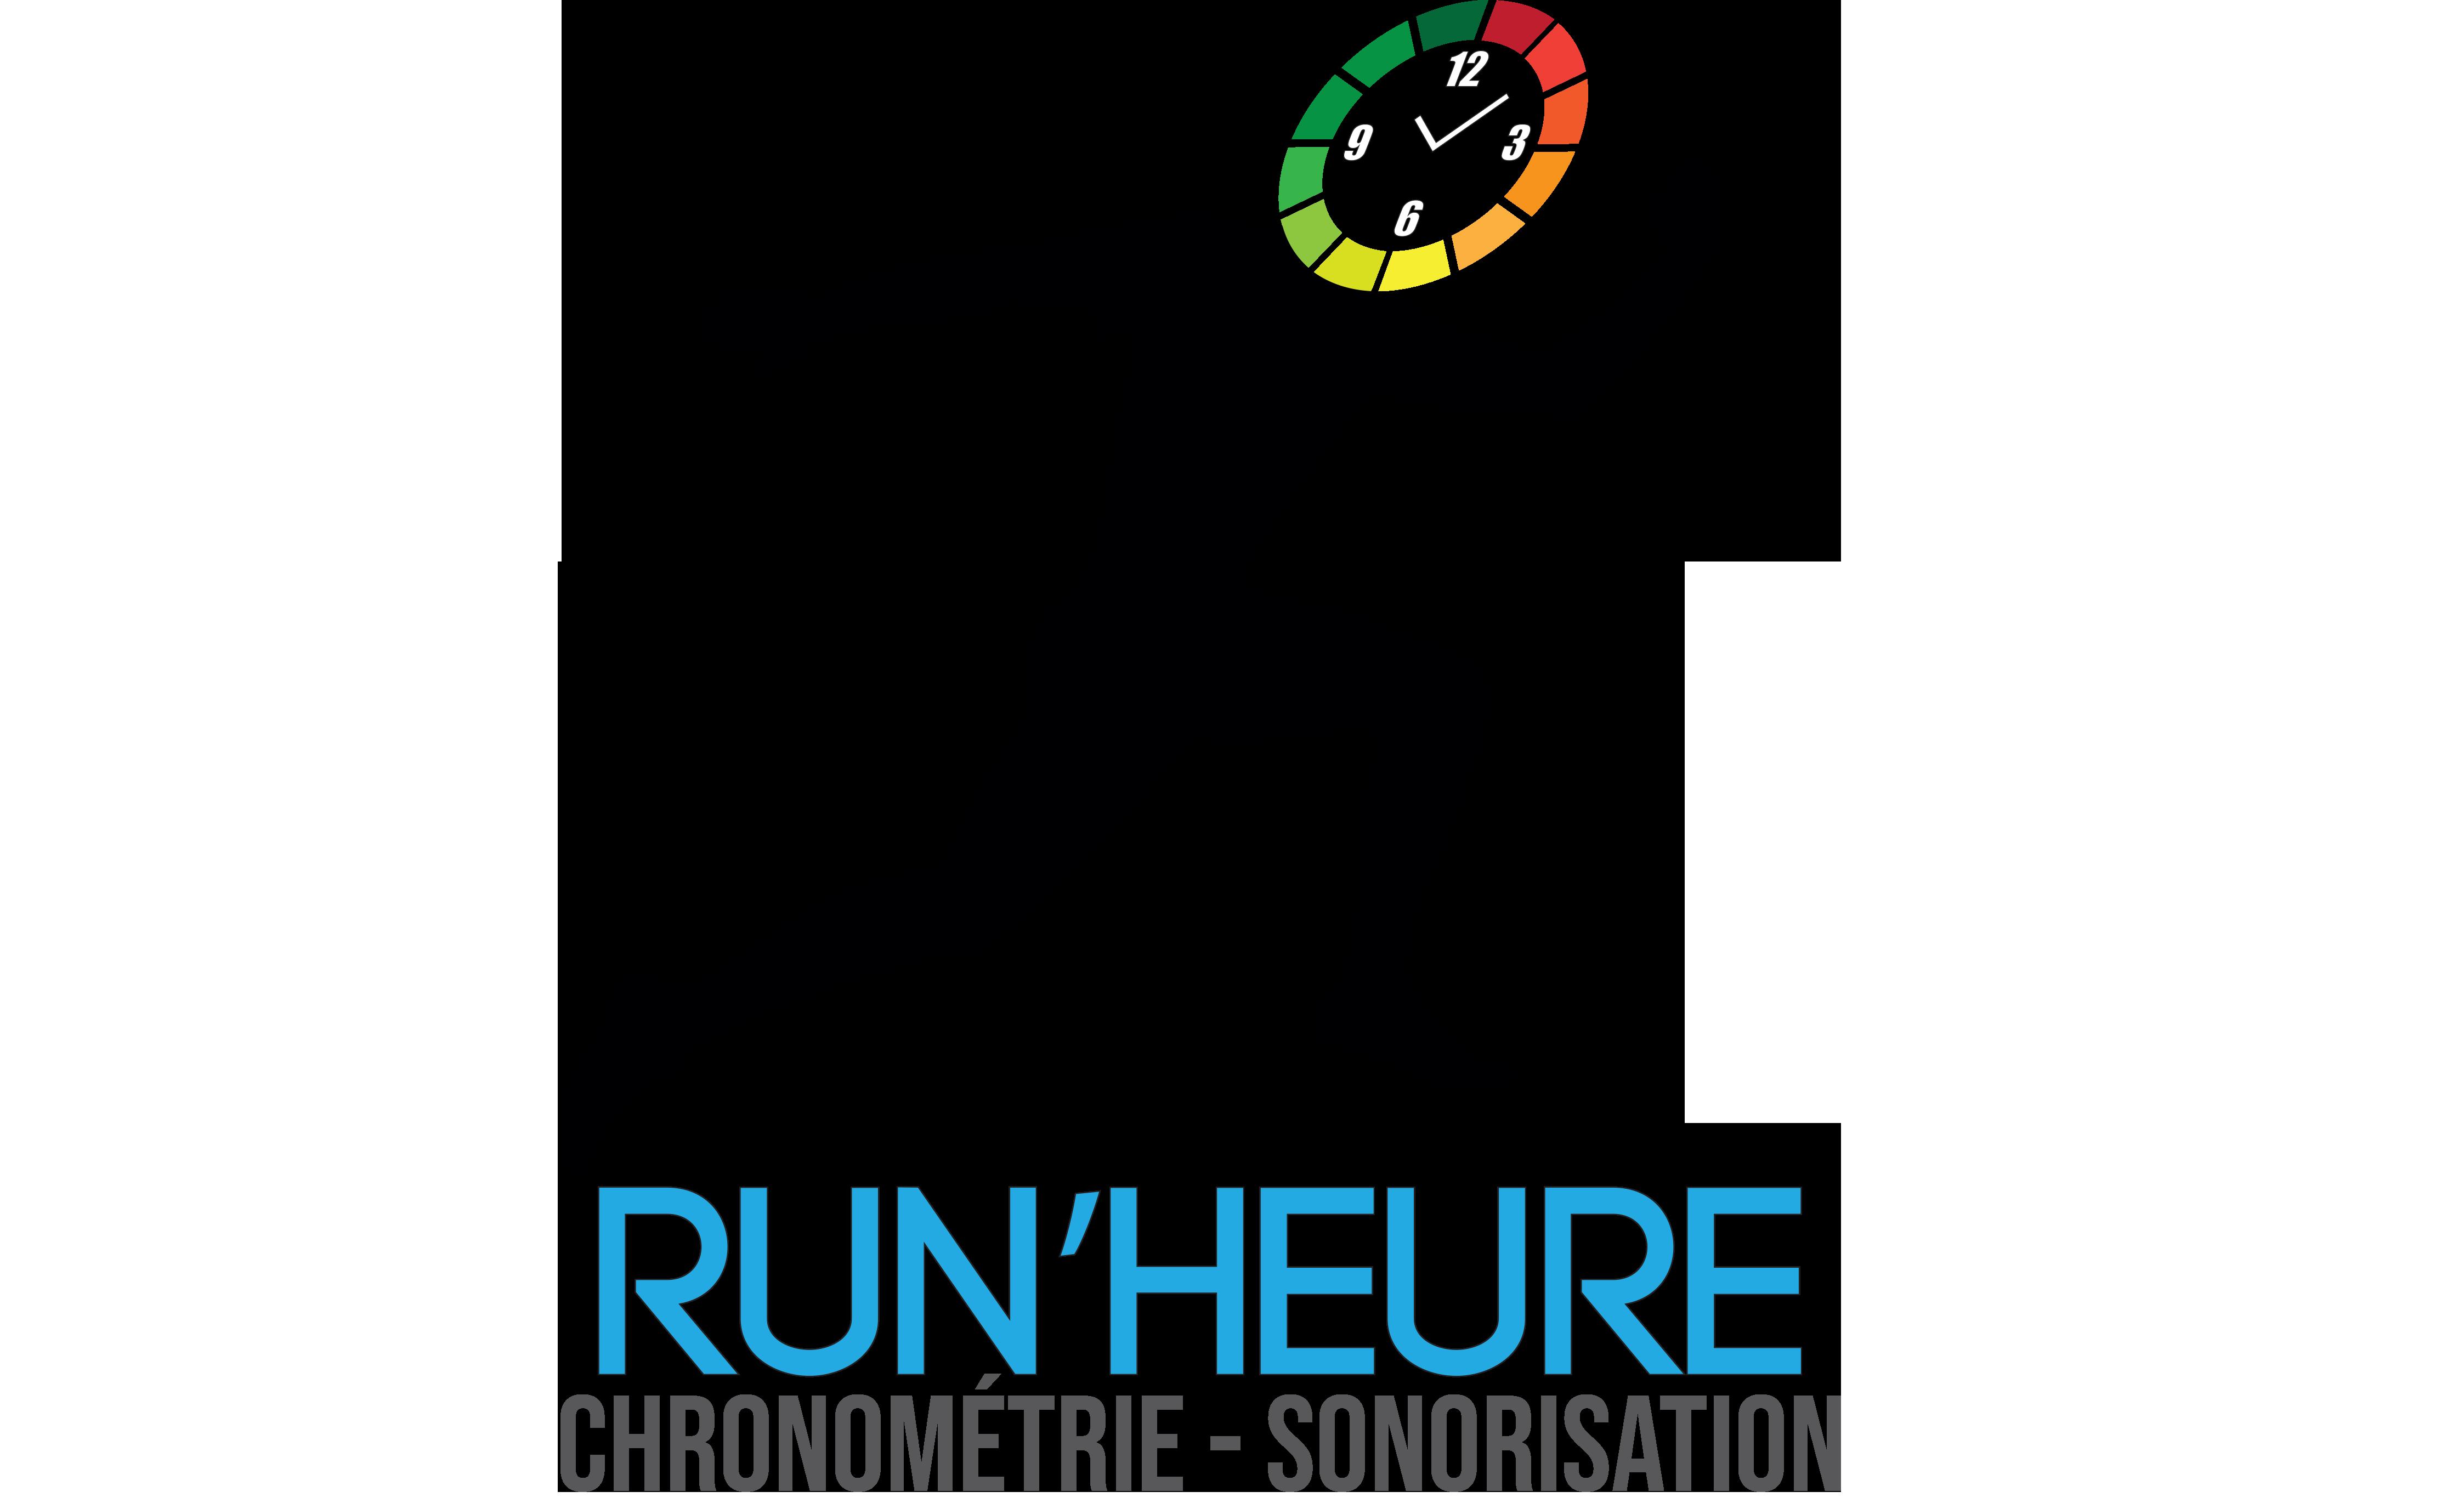 Run'Heure